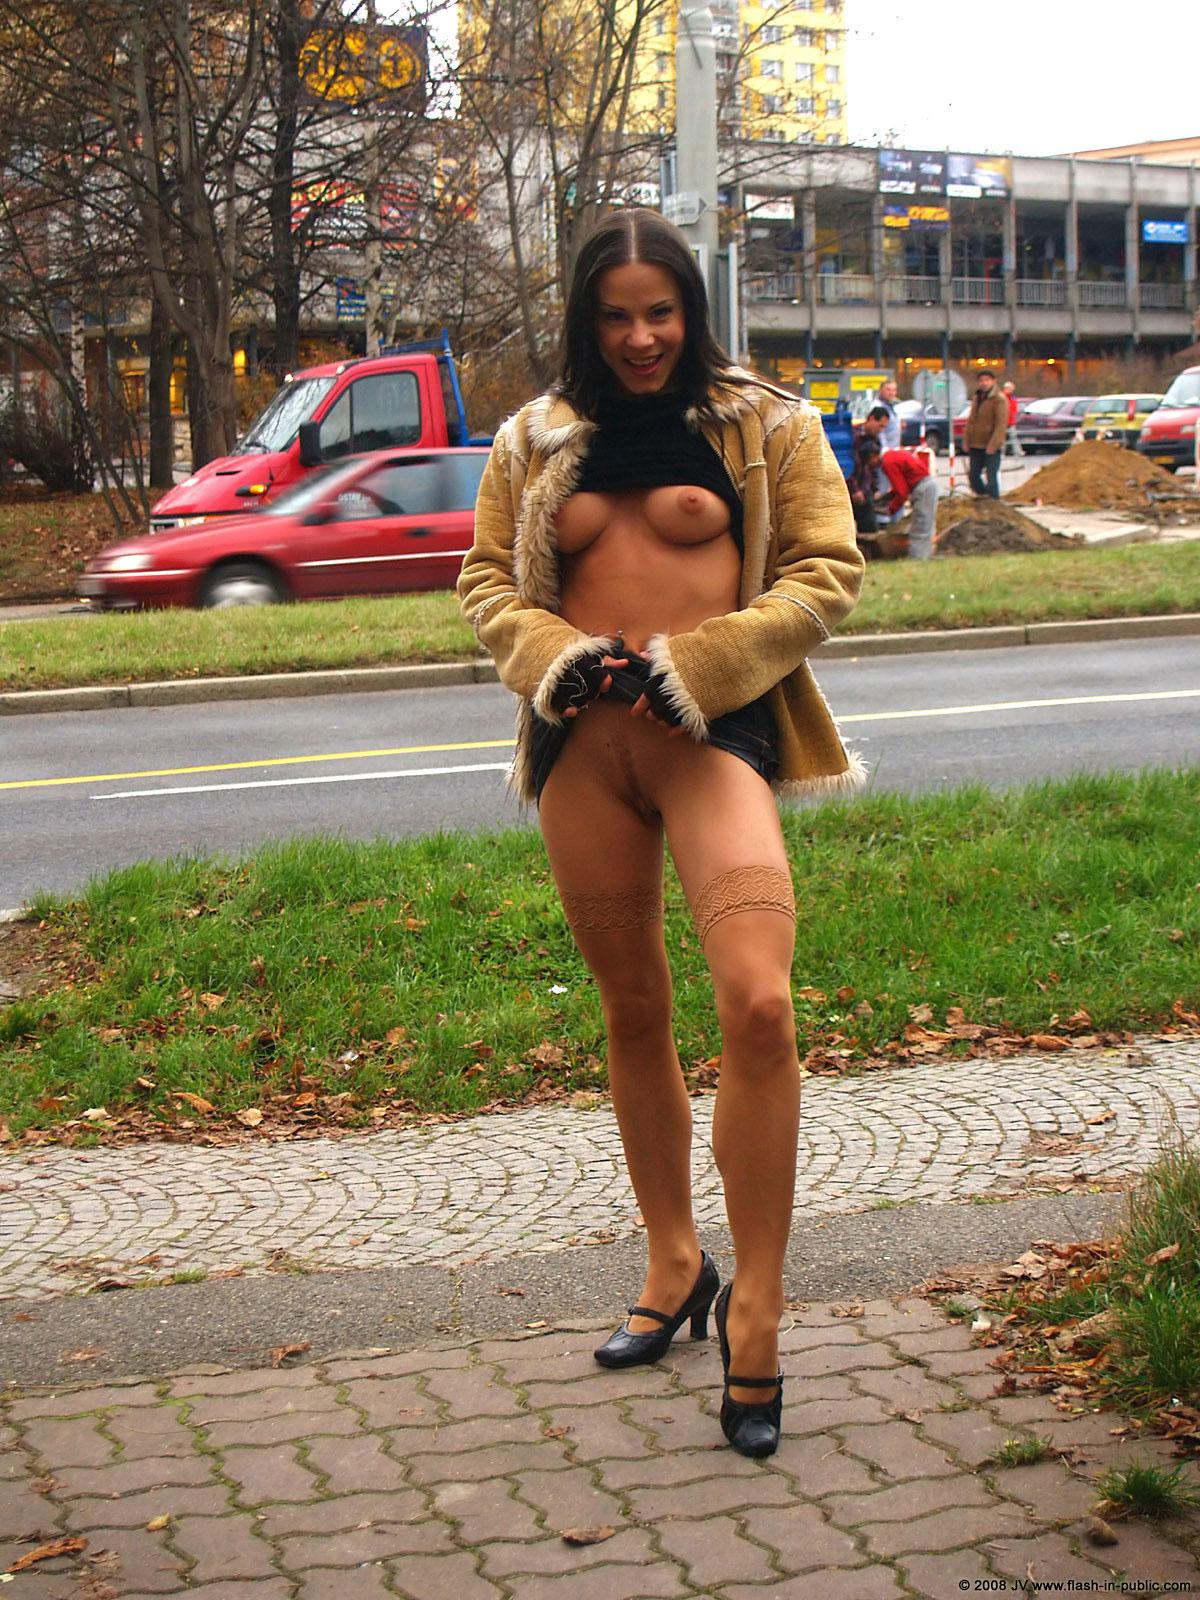 alexandra-g-bottomless-stockings-flash-in-public-15